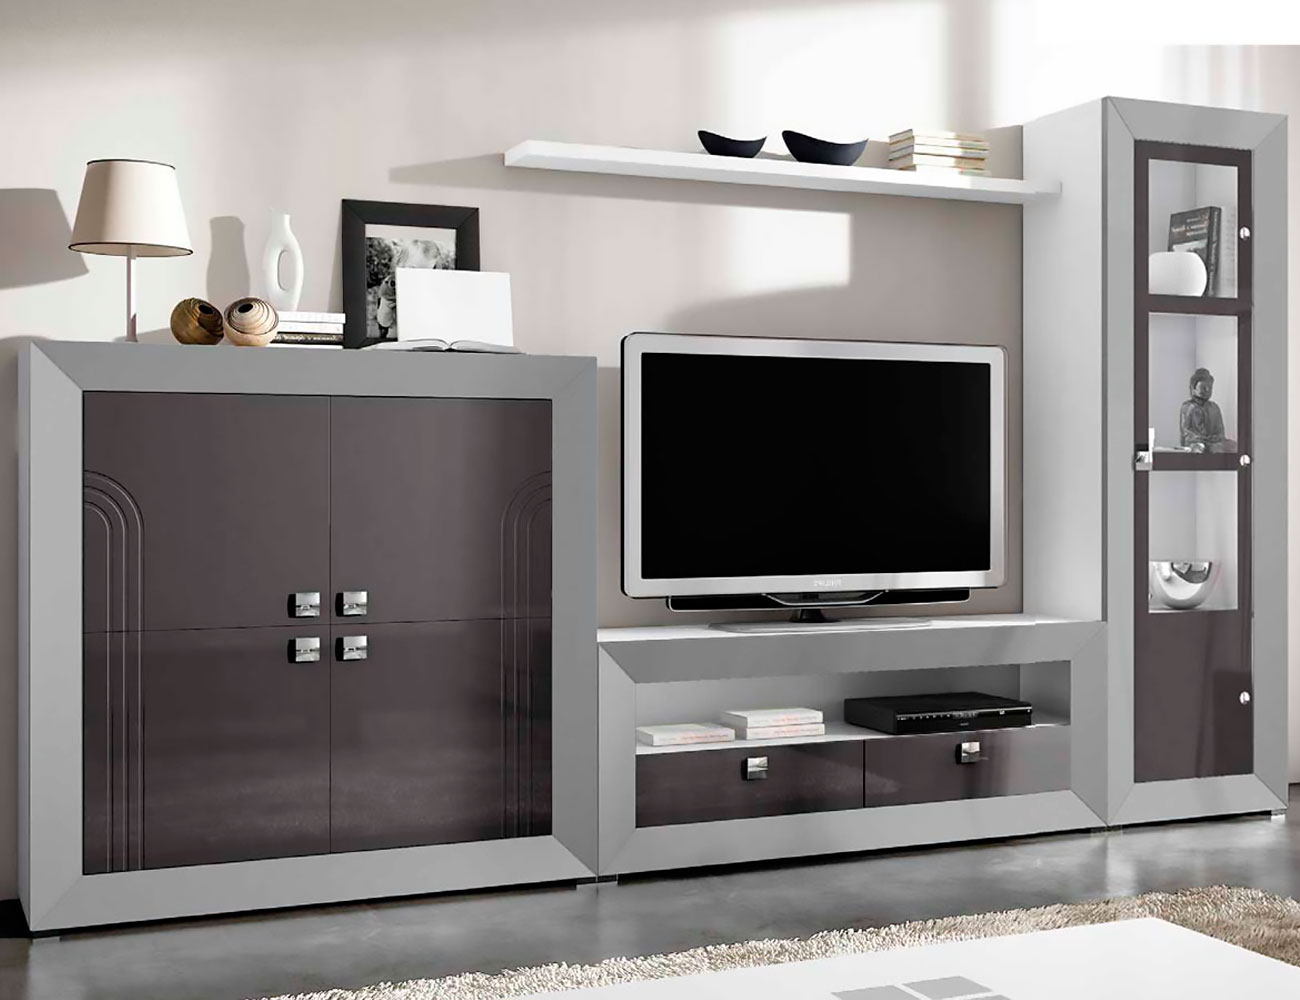 Mueble salon moderno 07